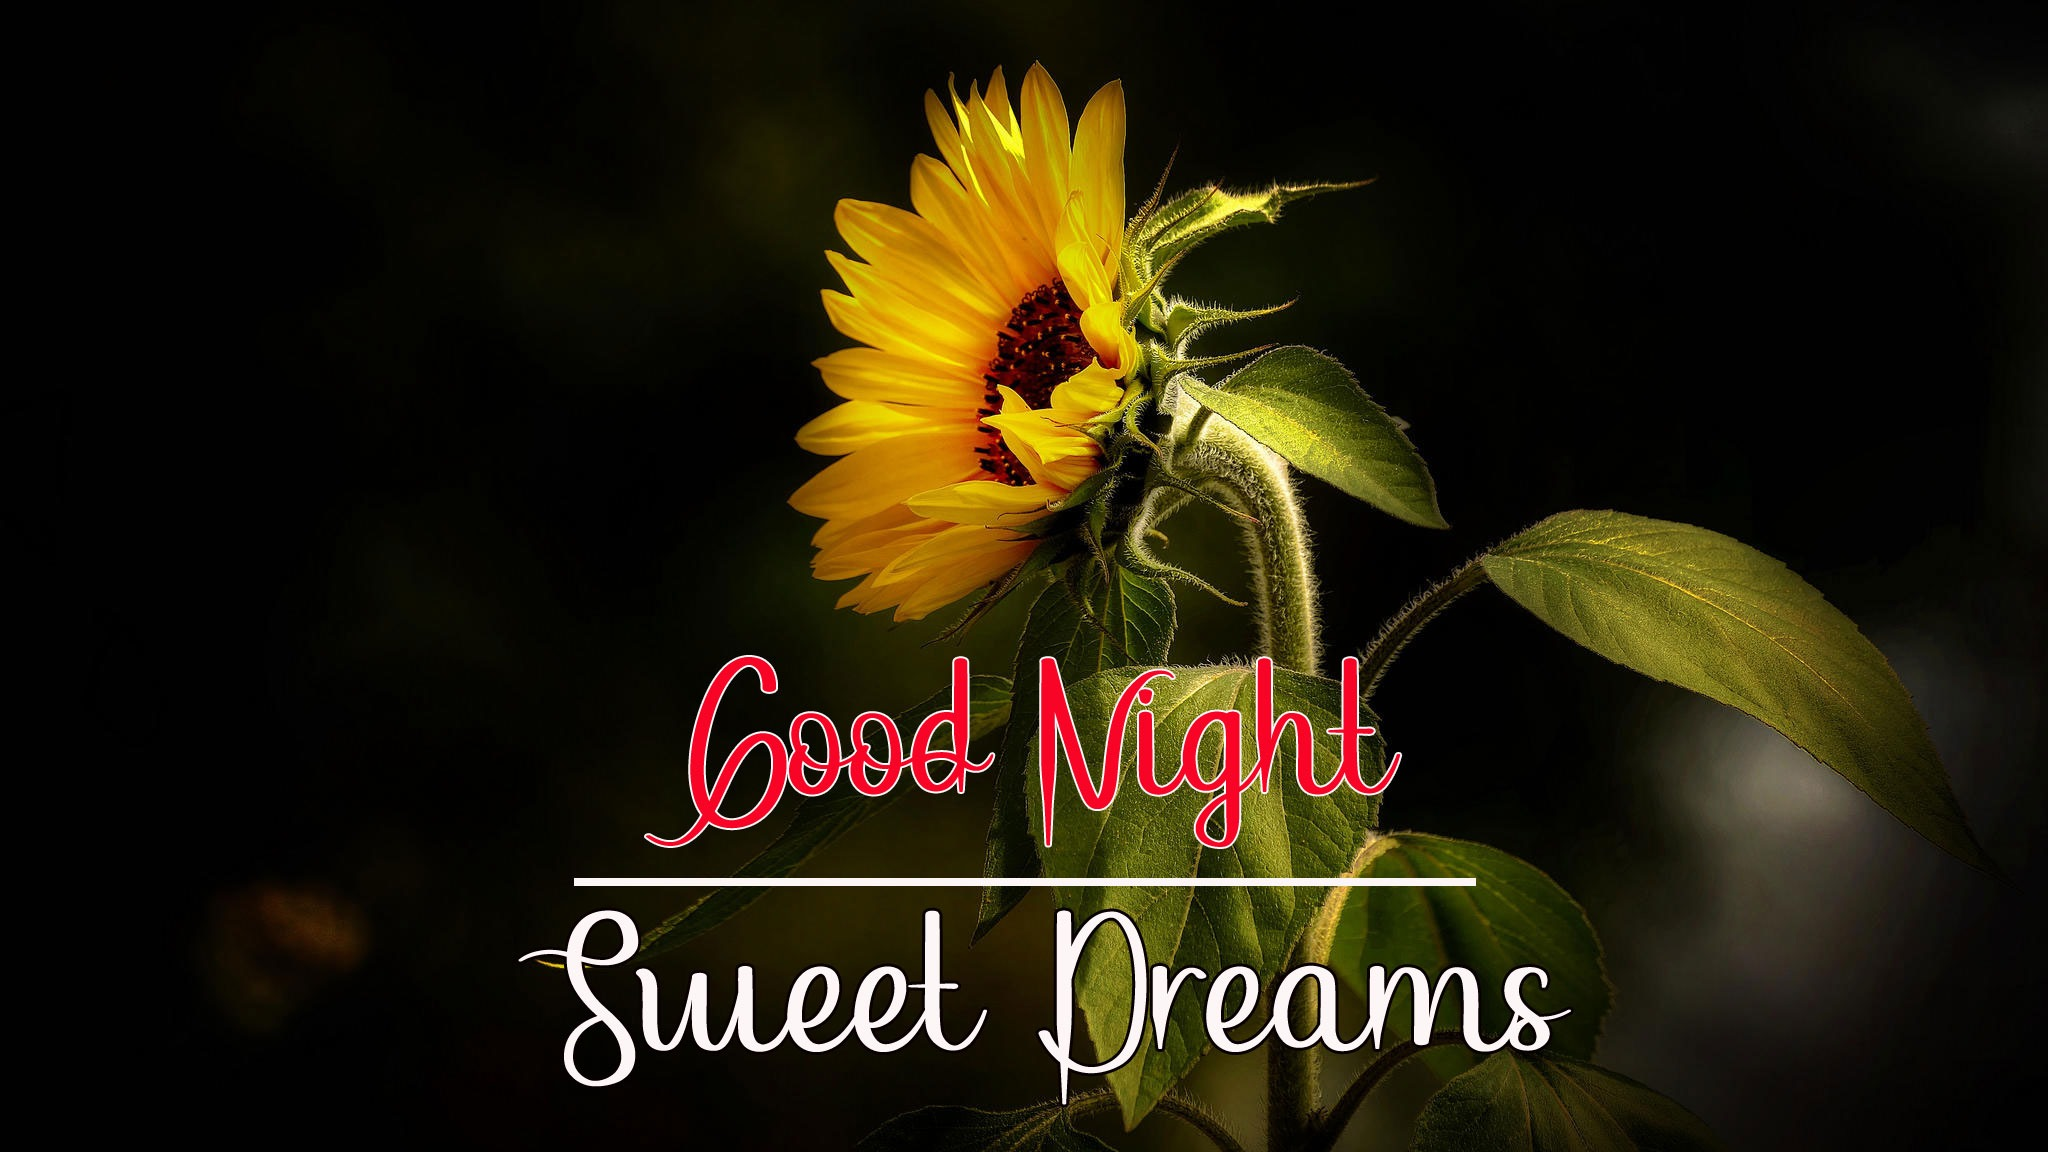 Best Good Night Images pics wallpaper hd